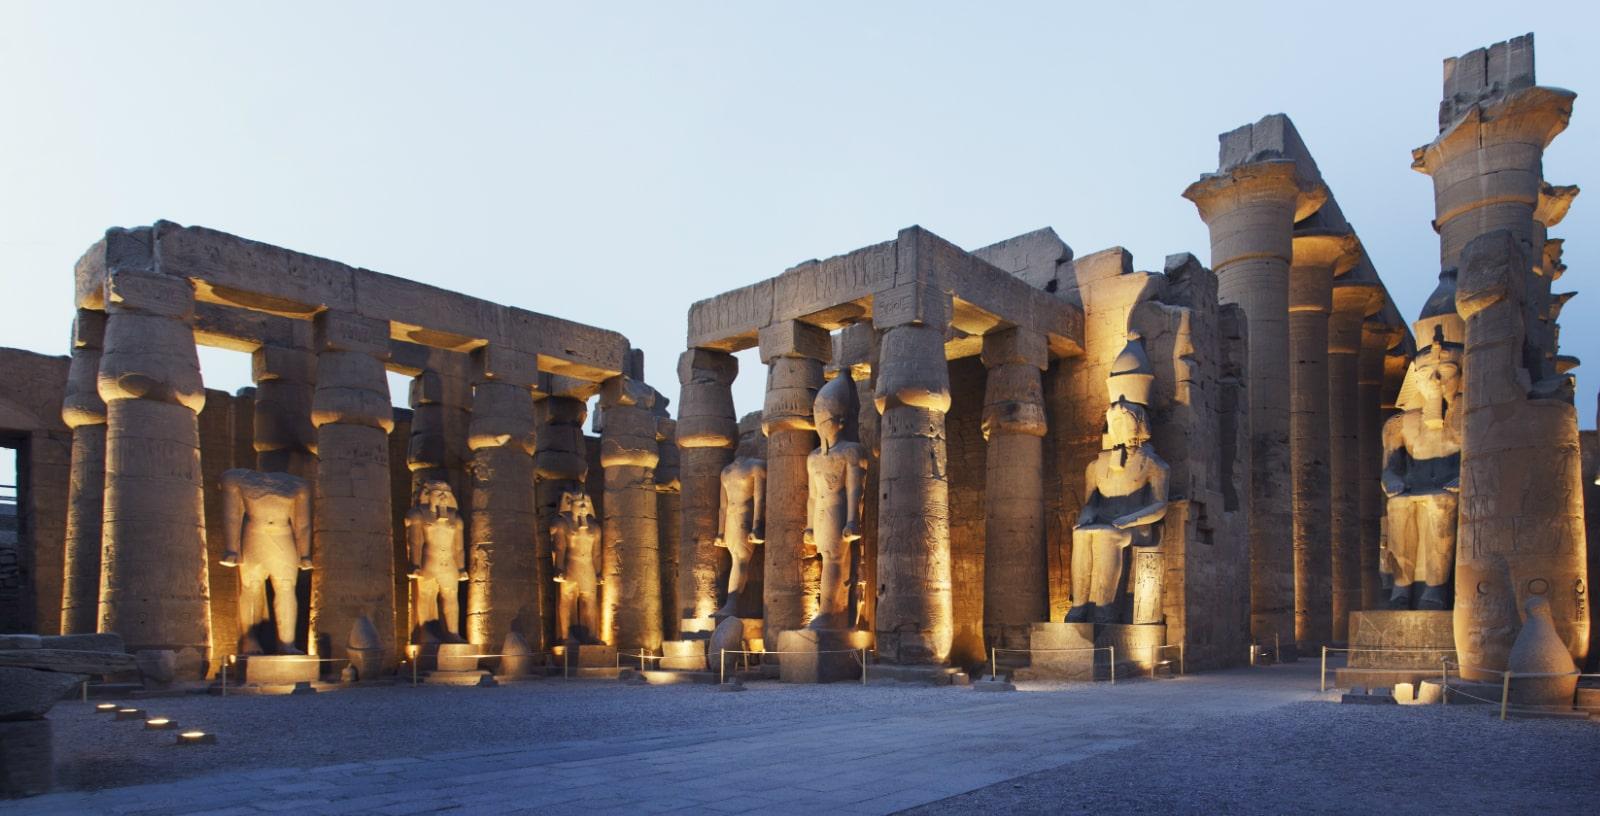 IDOM_Seguridad Egipto_4